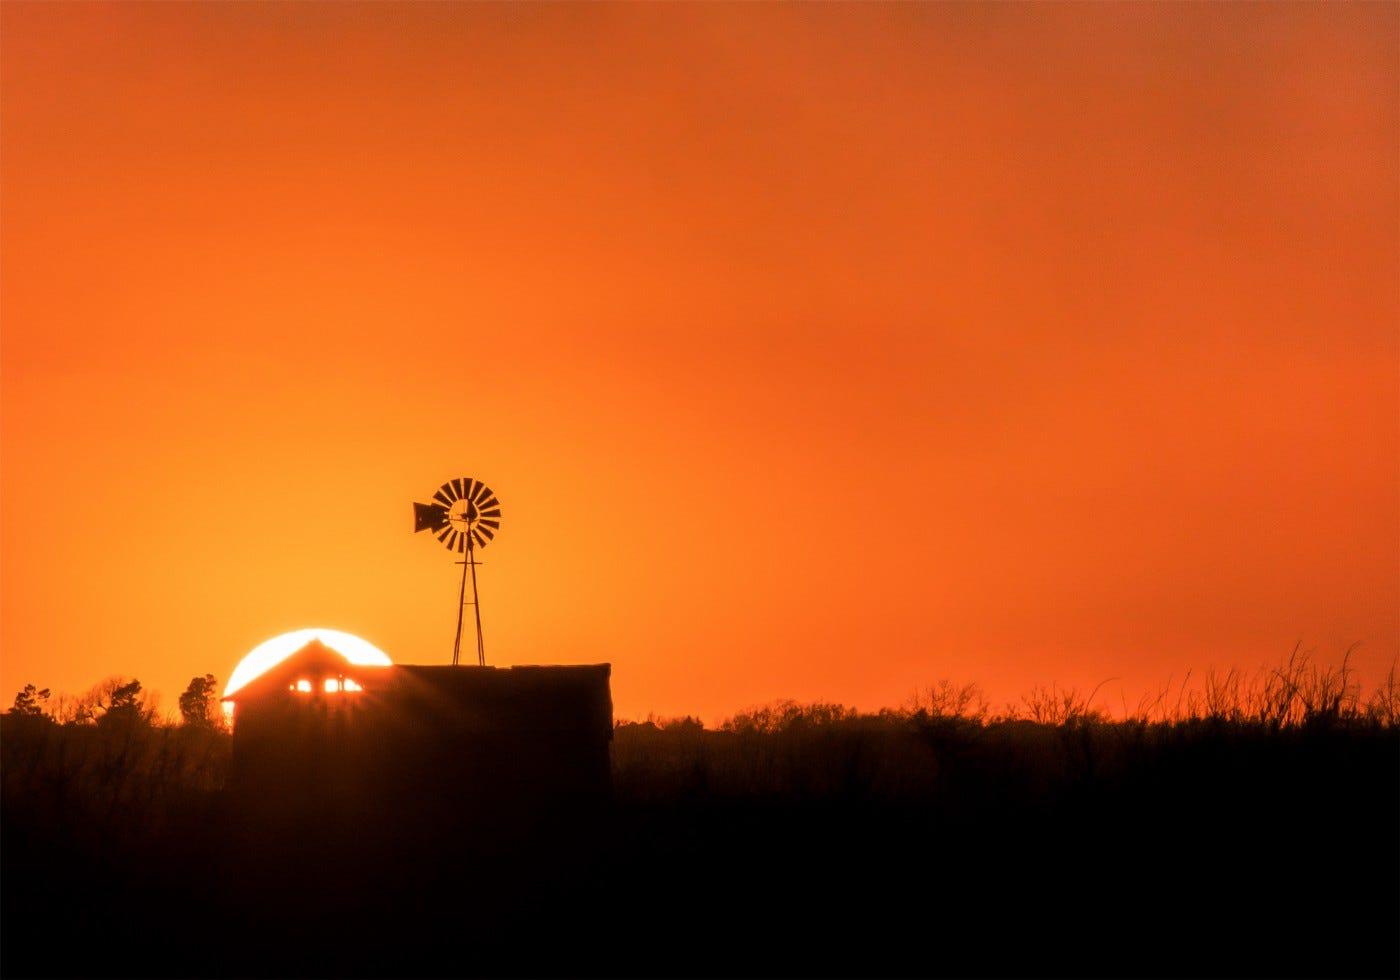 The sun setting behind a barn